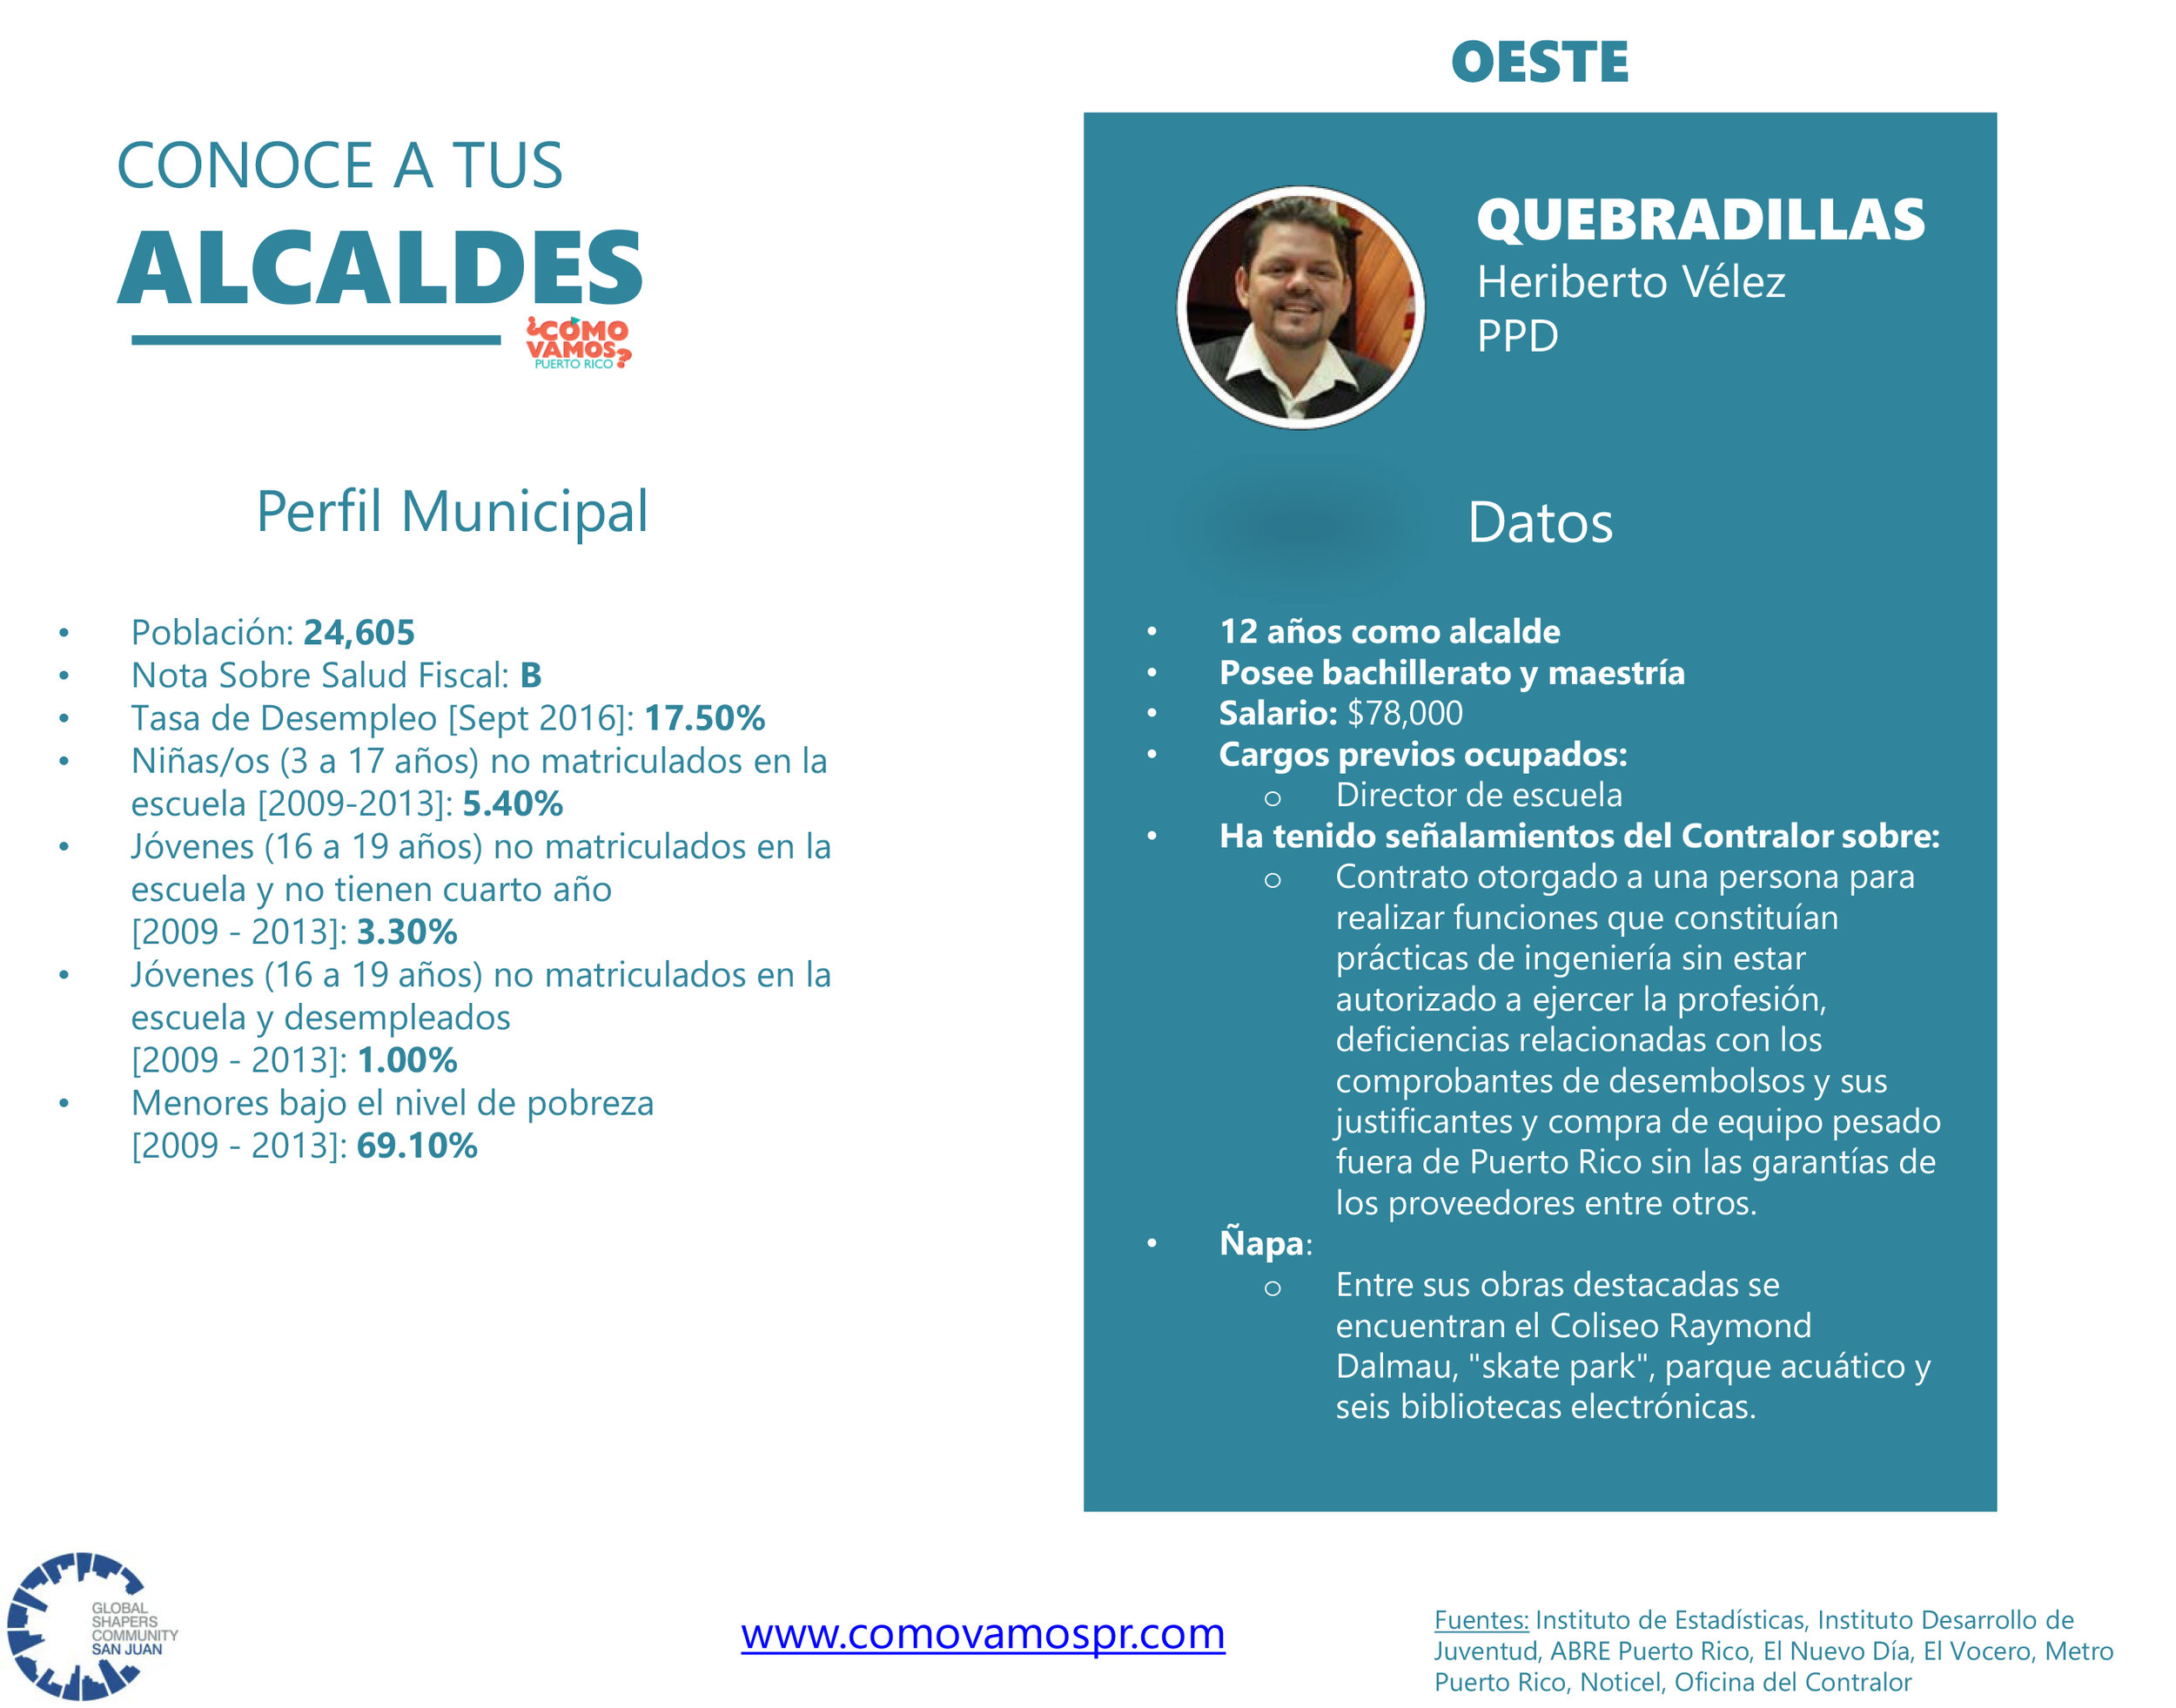 Alcaldes_Oeste_Quebradillas.jpg